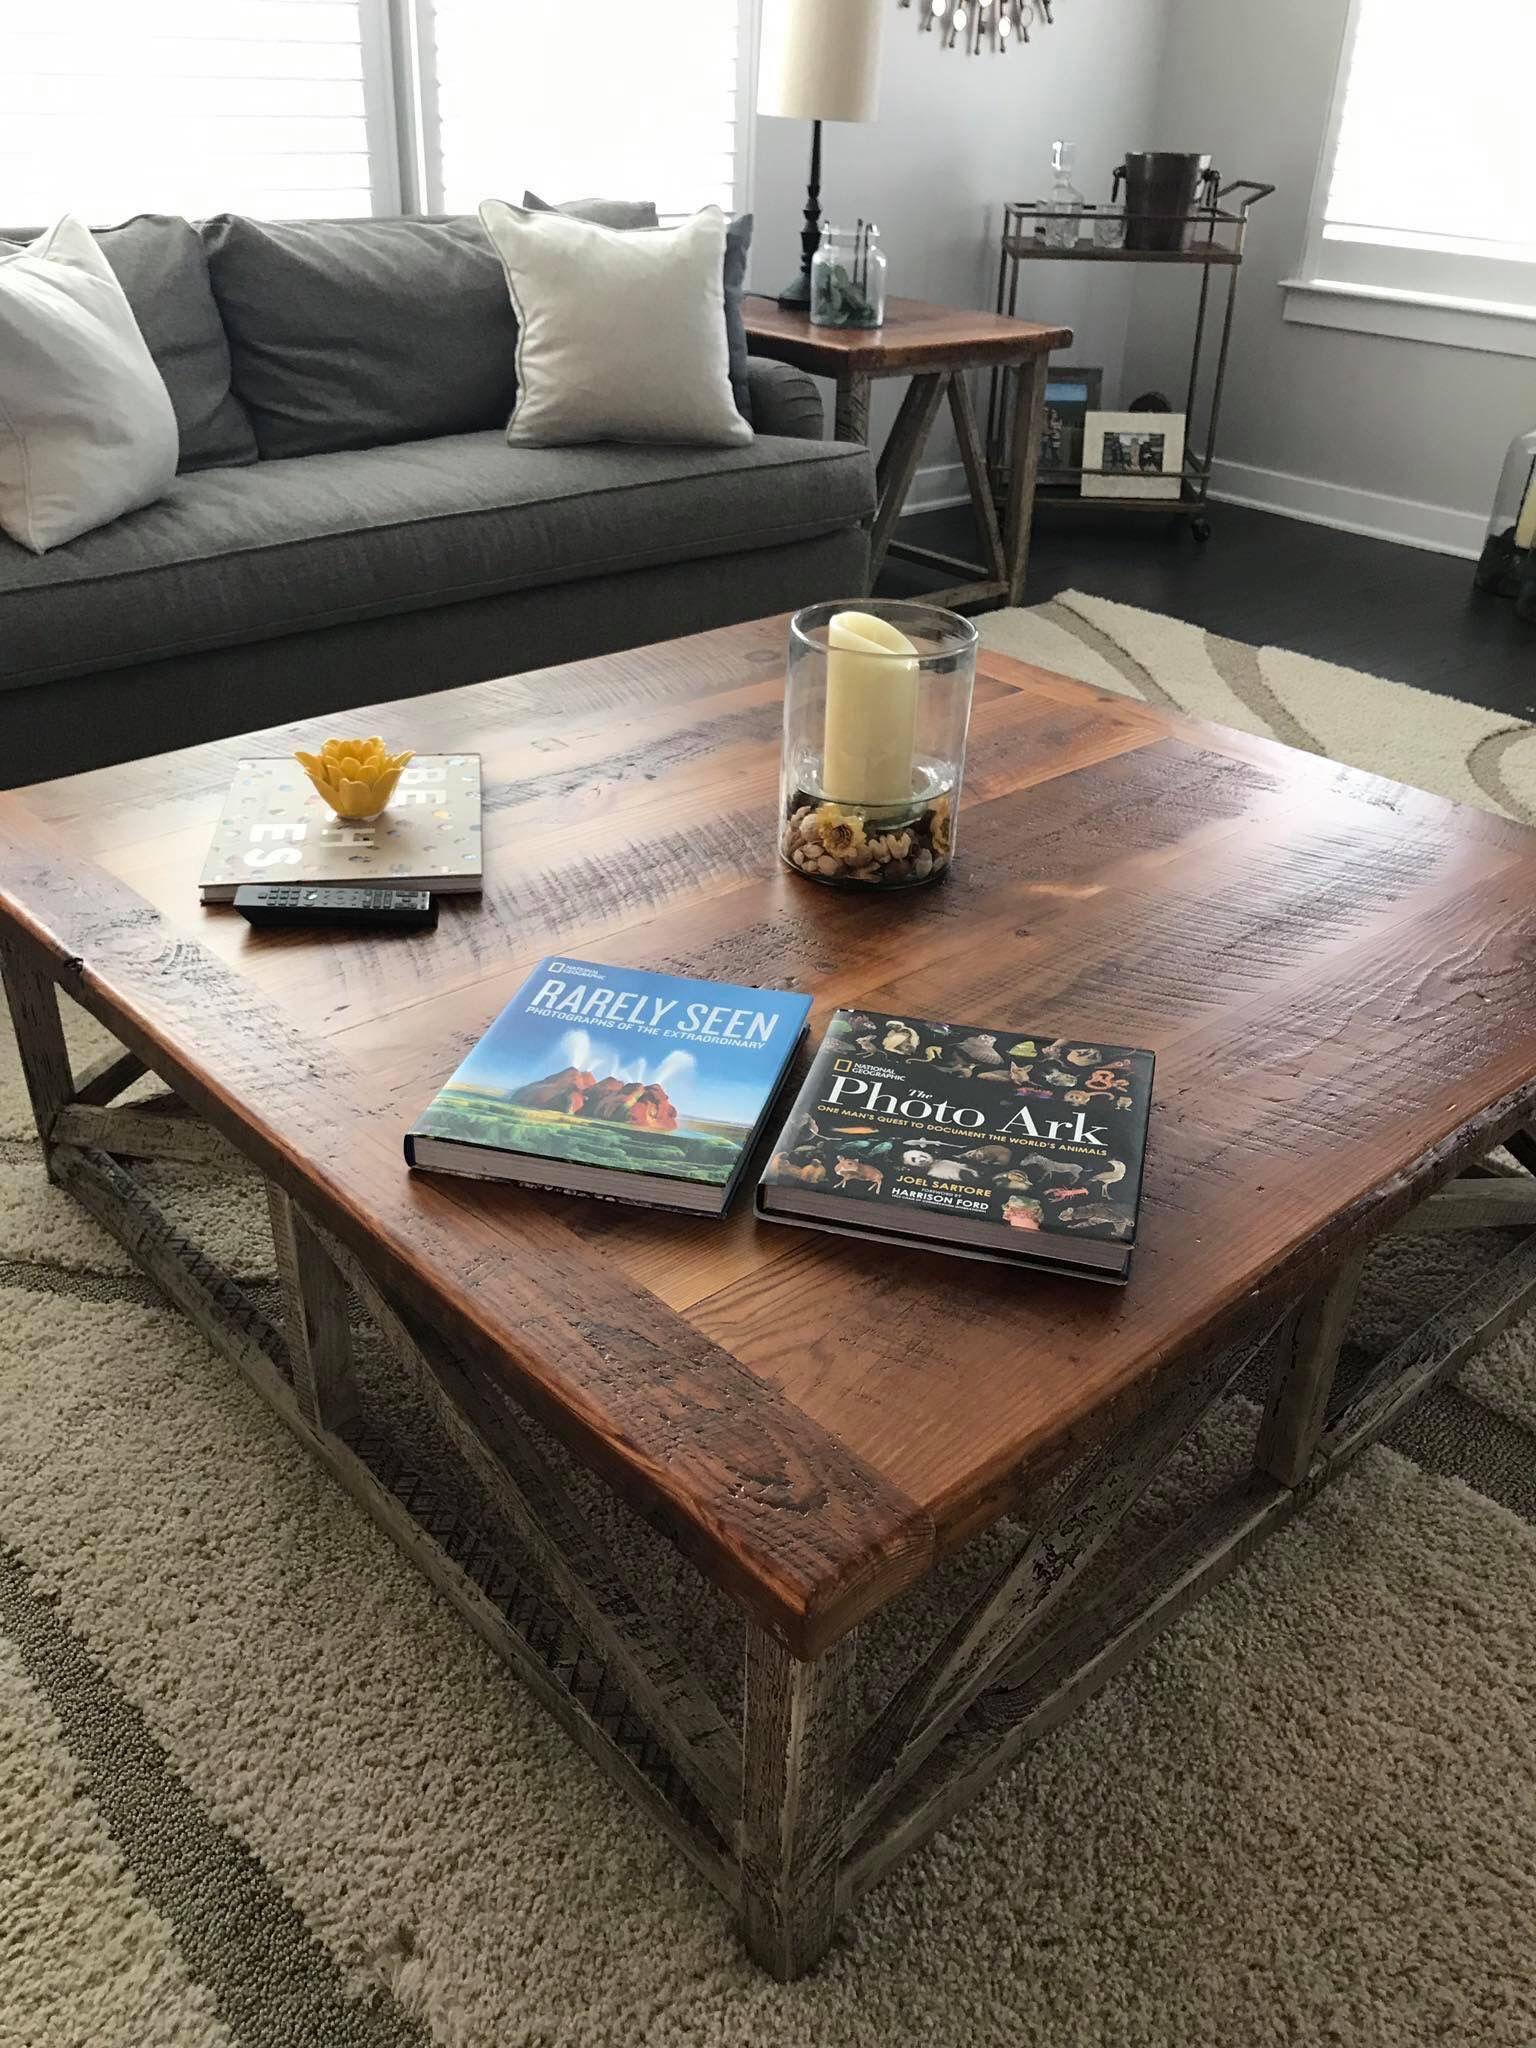 Reclaimed Wood Coffee Tables Coffee Table Wood Reclaimed Wood Coffee Table Coffee Table [ 2048 x 1536 Pixel ]